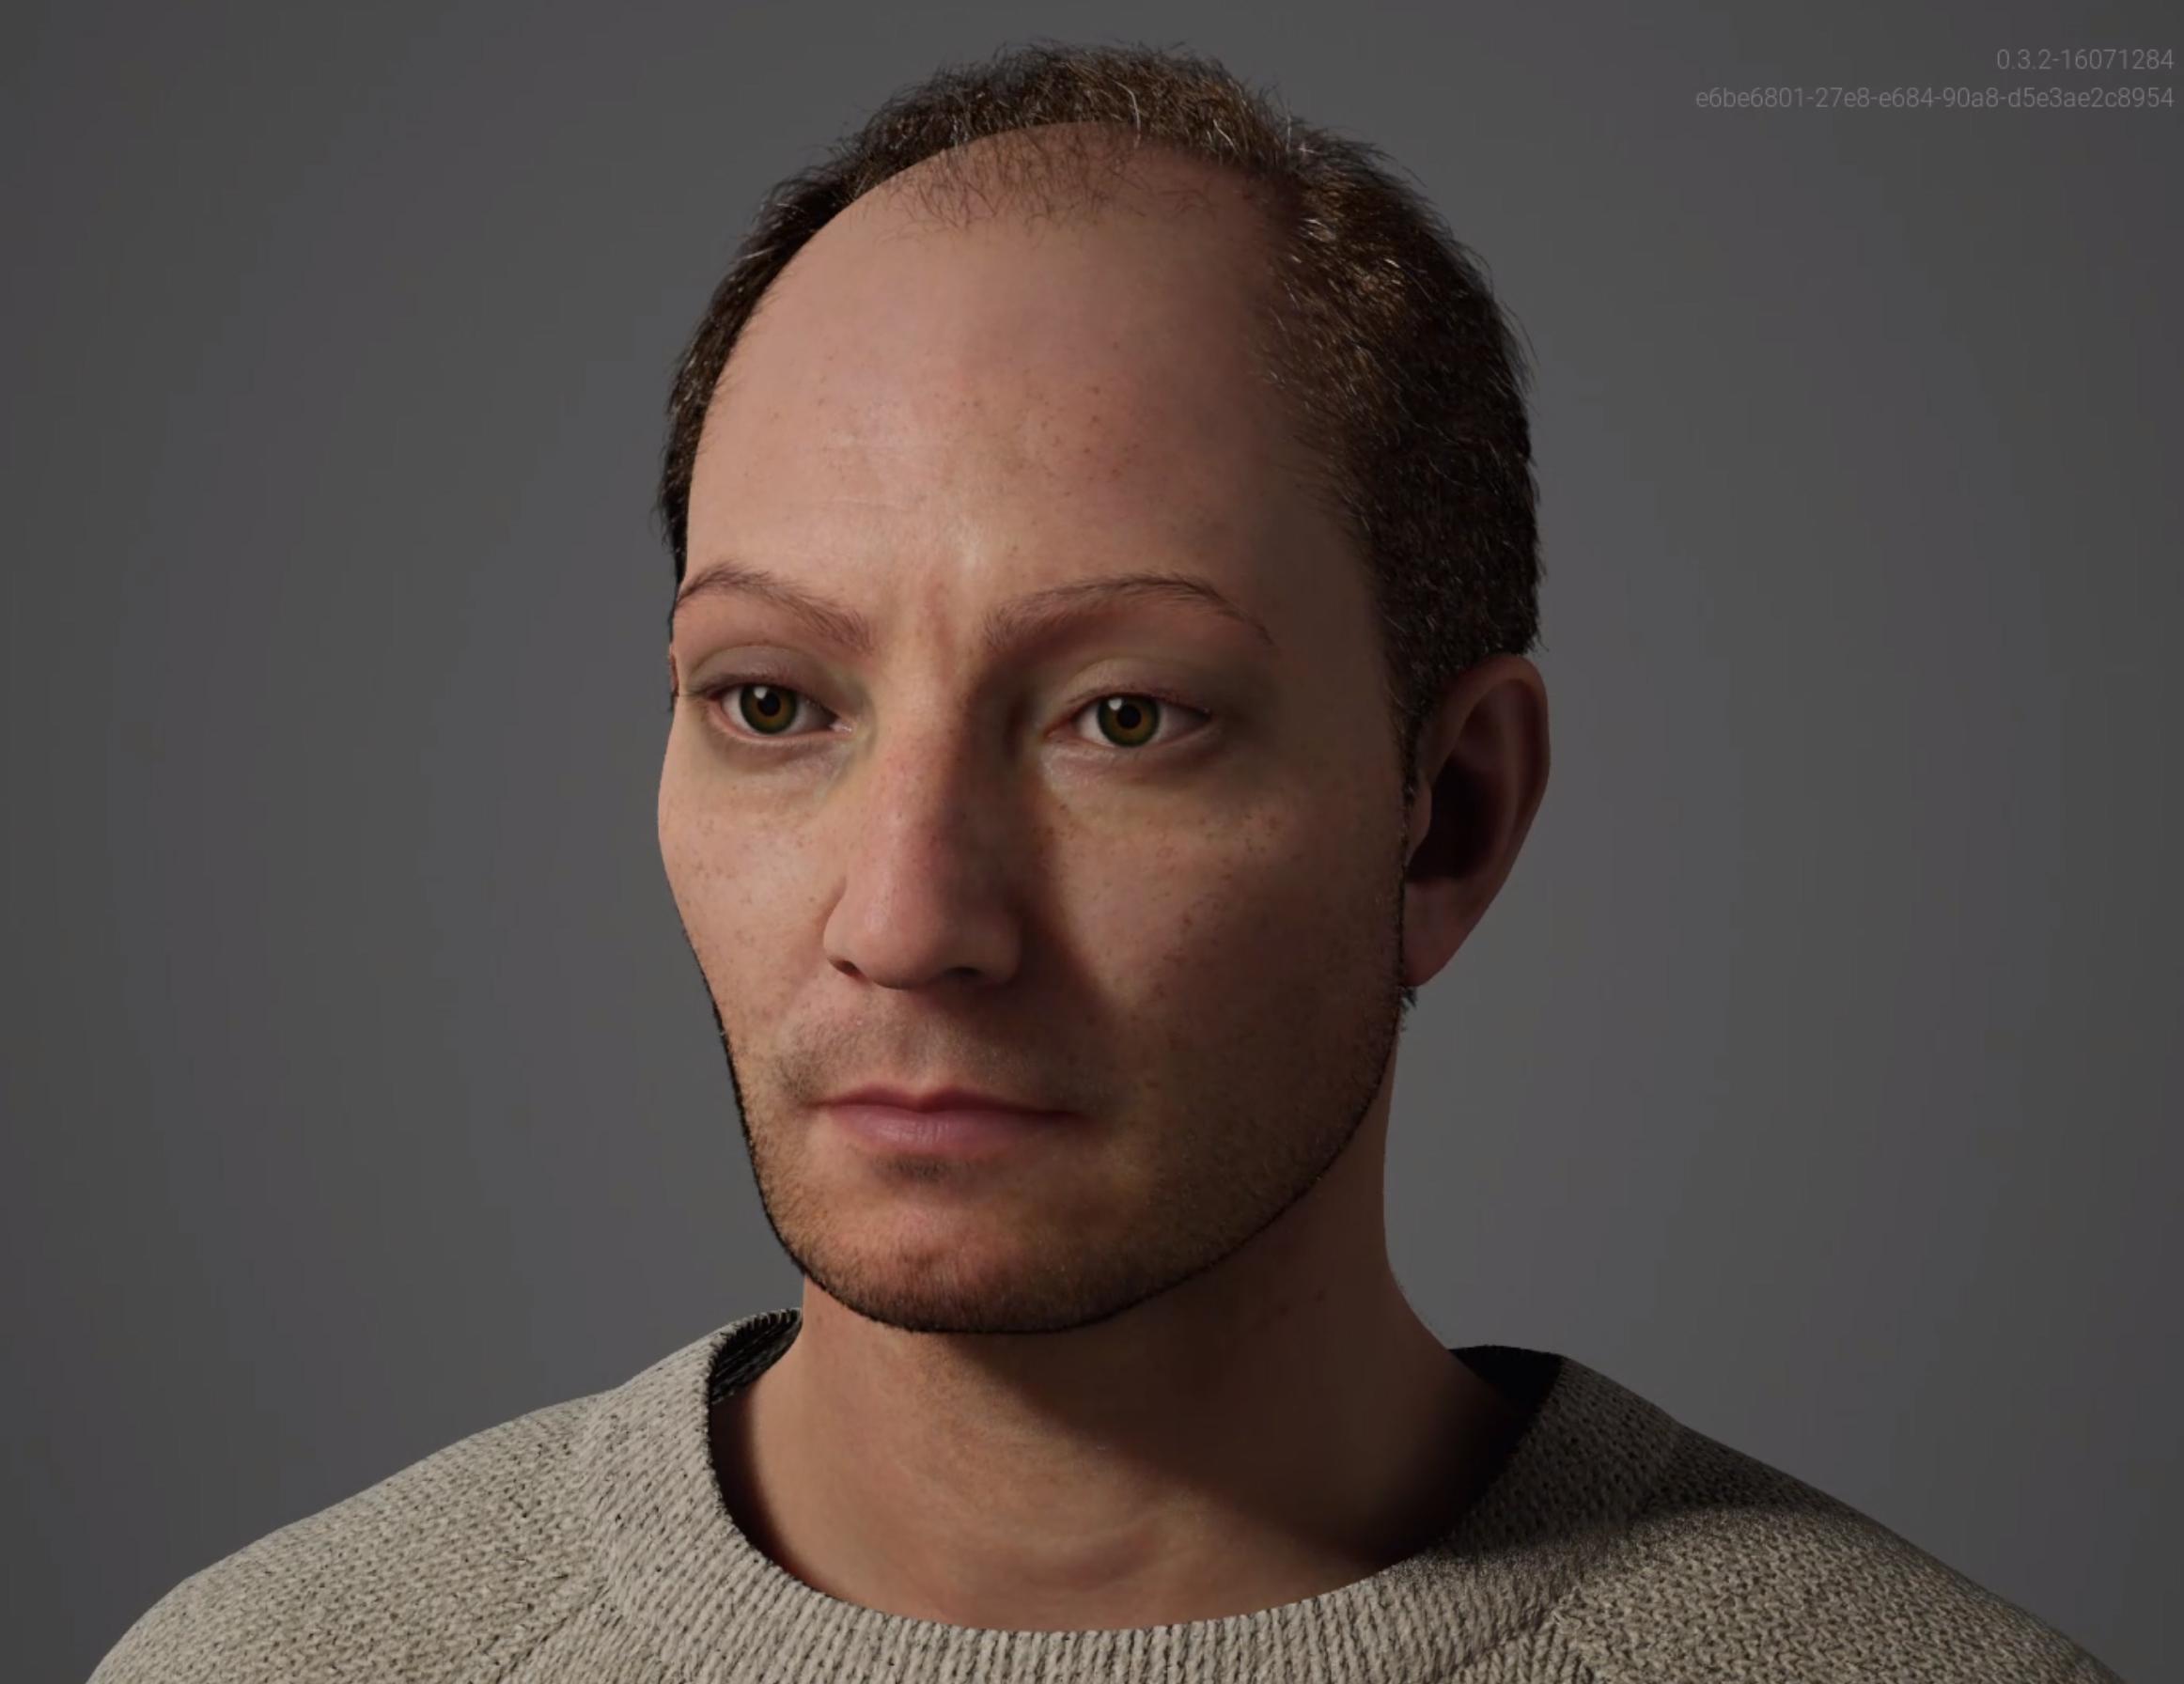 This is Claudio a MetaHuman created with the Unreal Engine Metahuman Creator